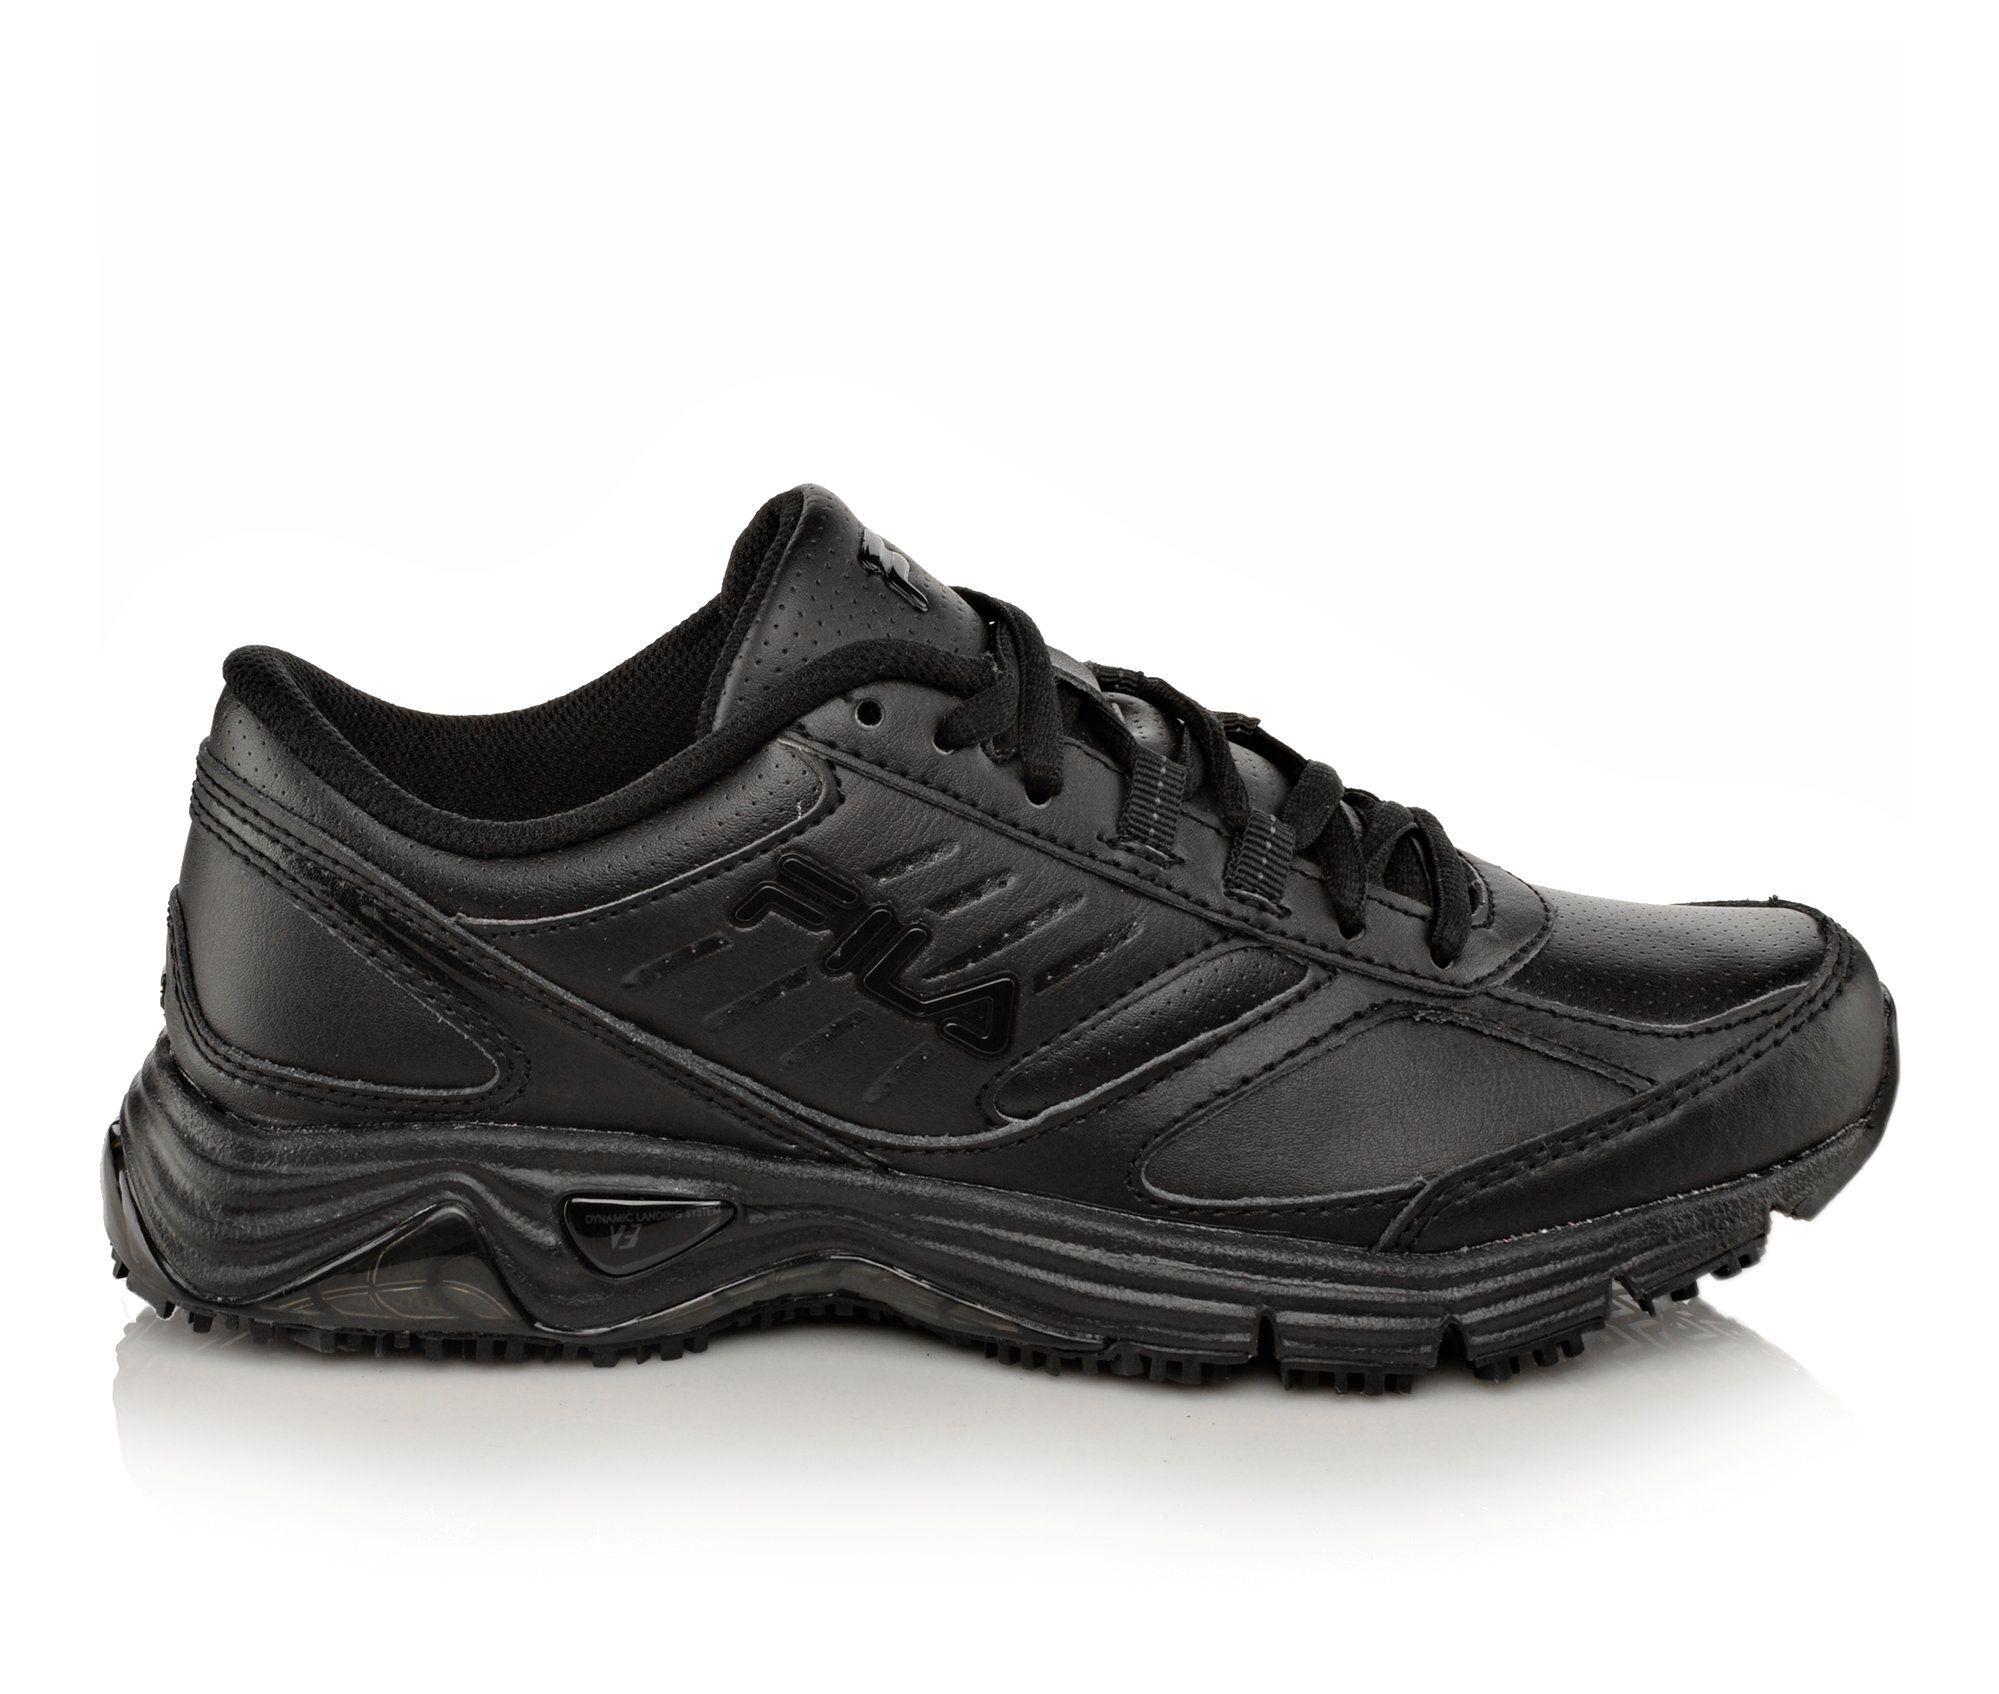 purchase new style Women's Fila Memory Flux Slip Resistant Slip Resistant Shoes Black